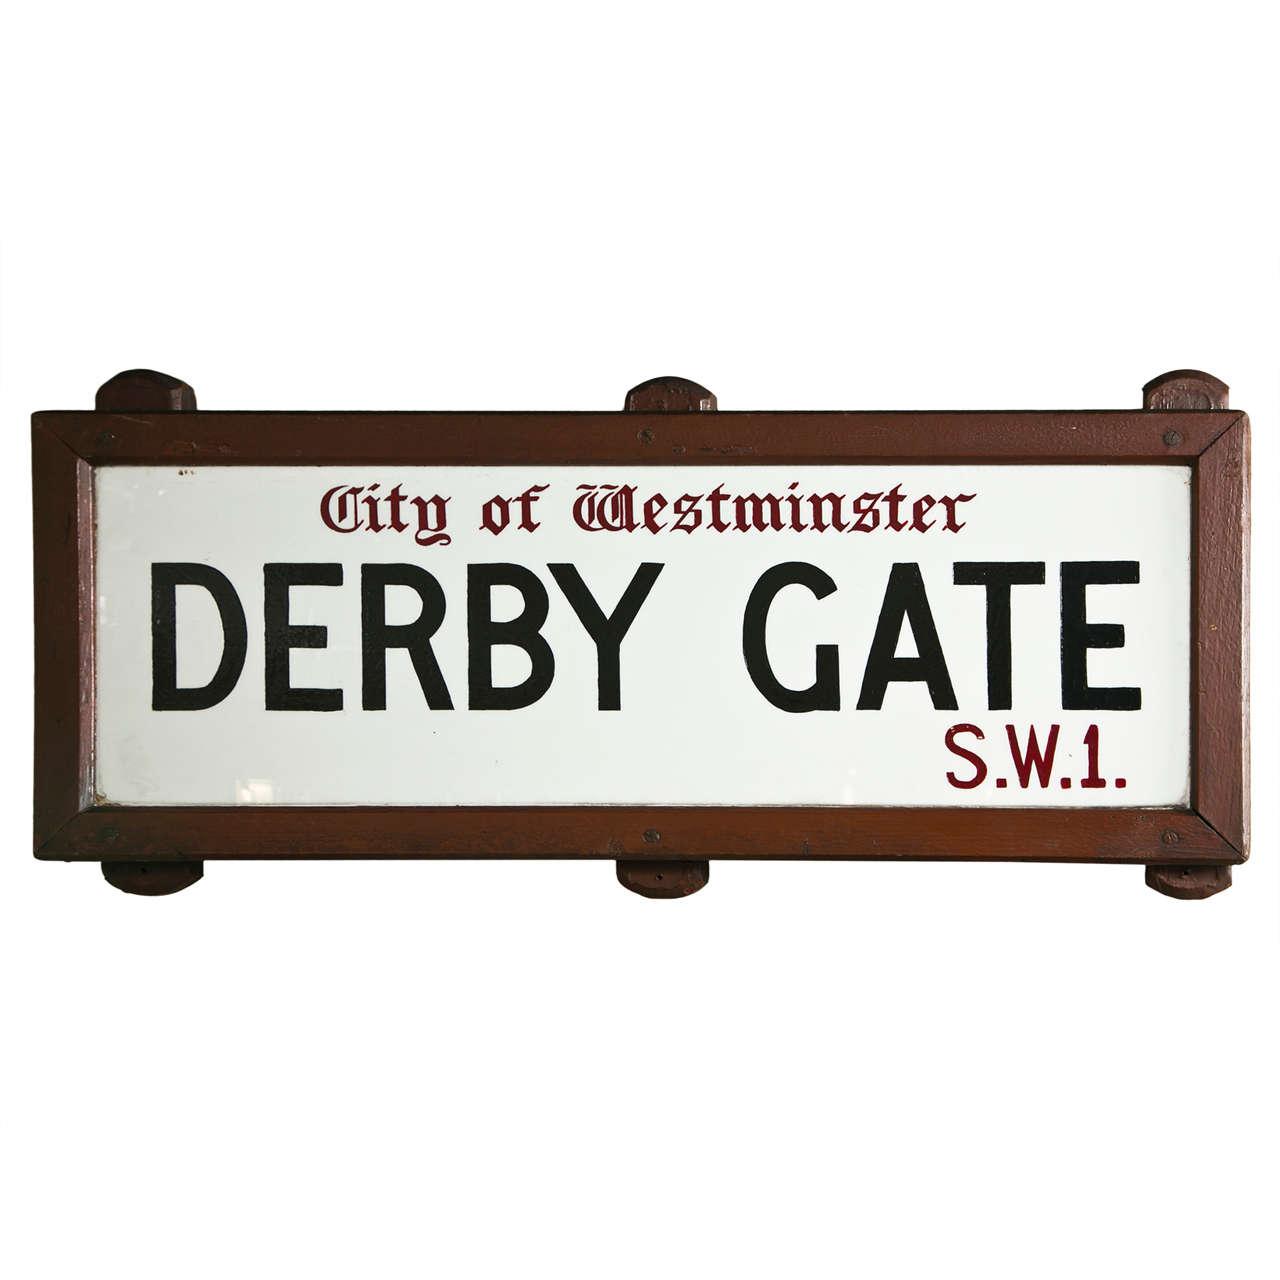 Vintage London Street Sign City Of Westminster Derby Gate